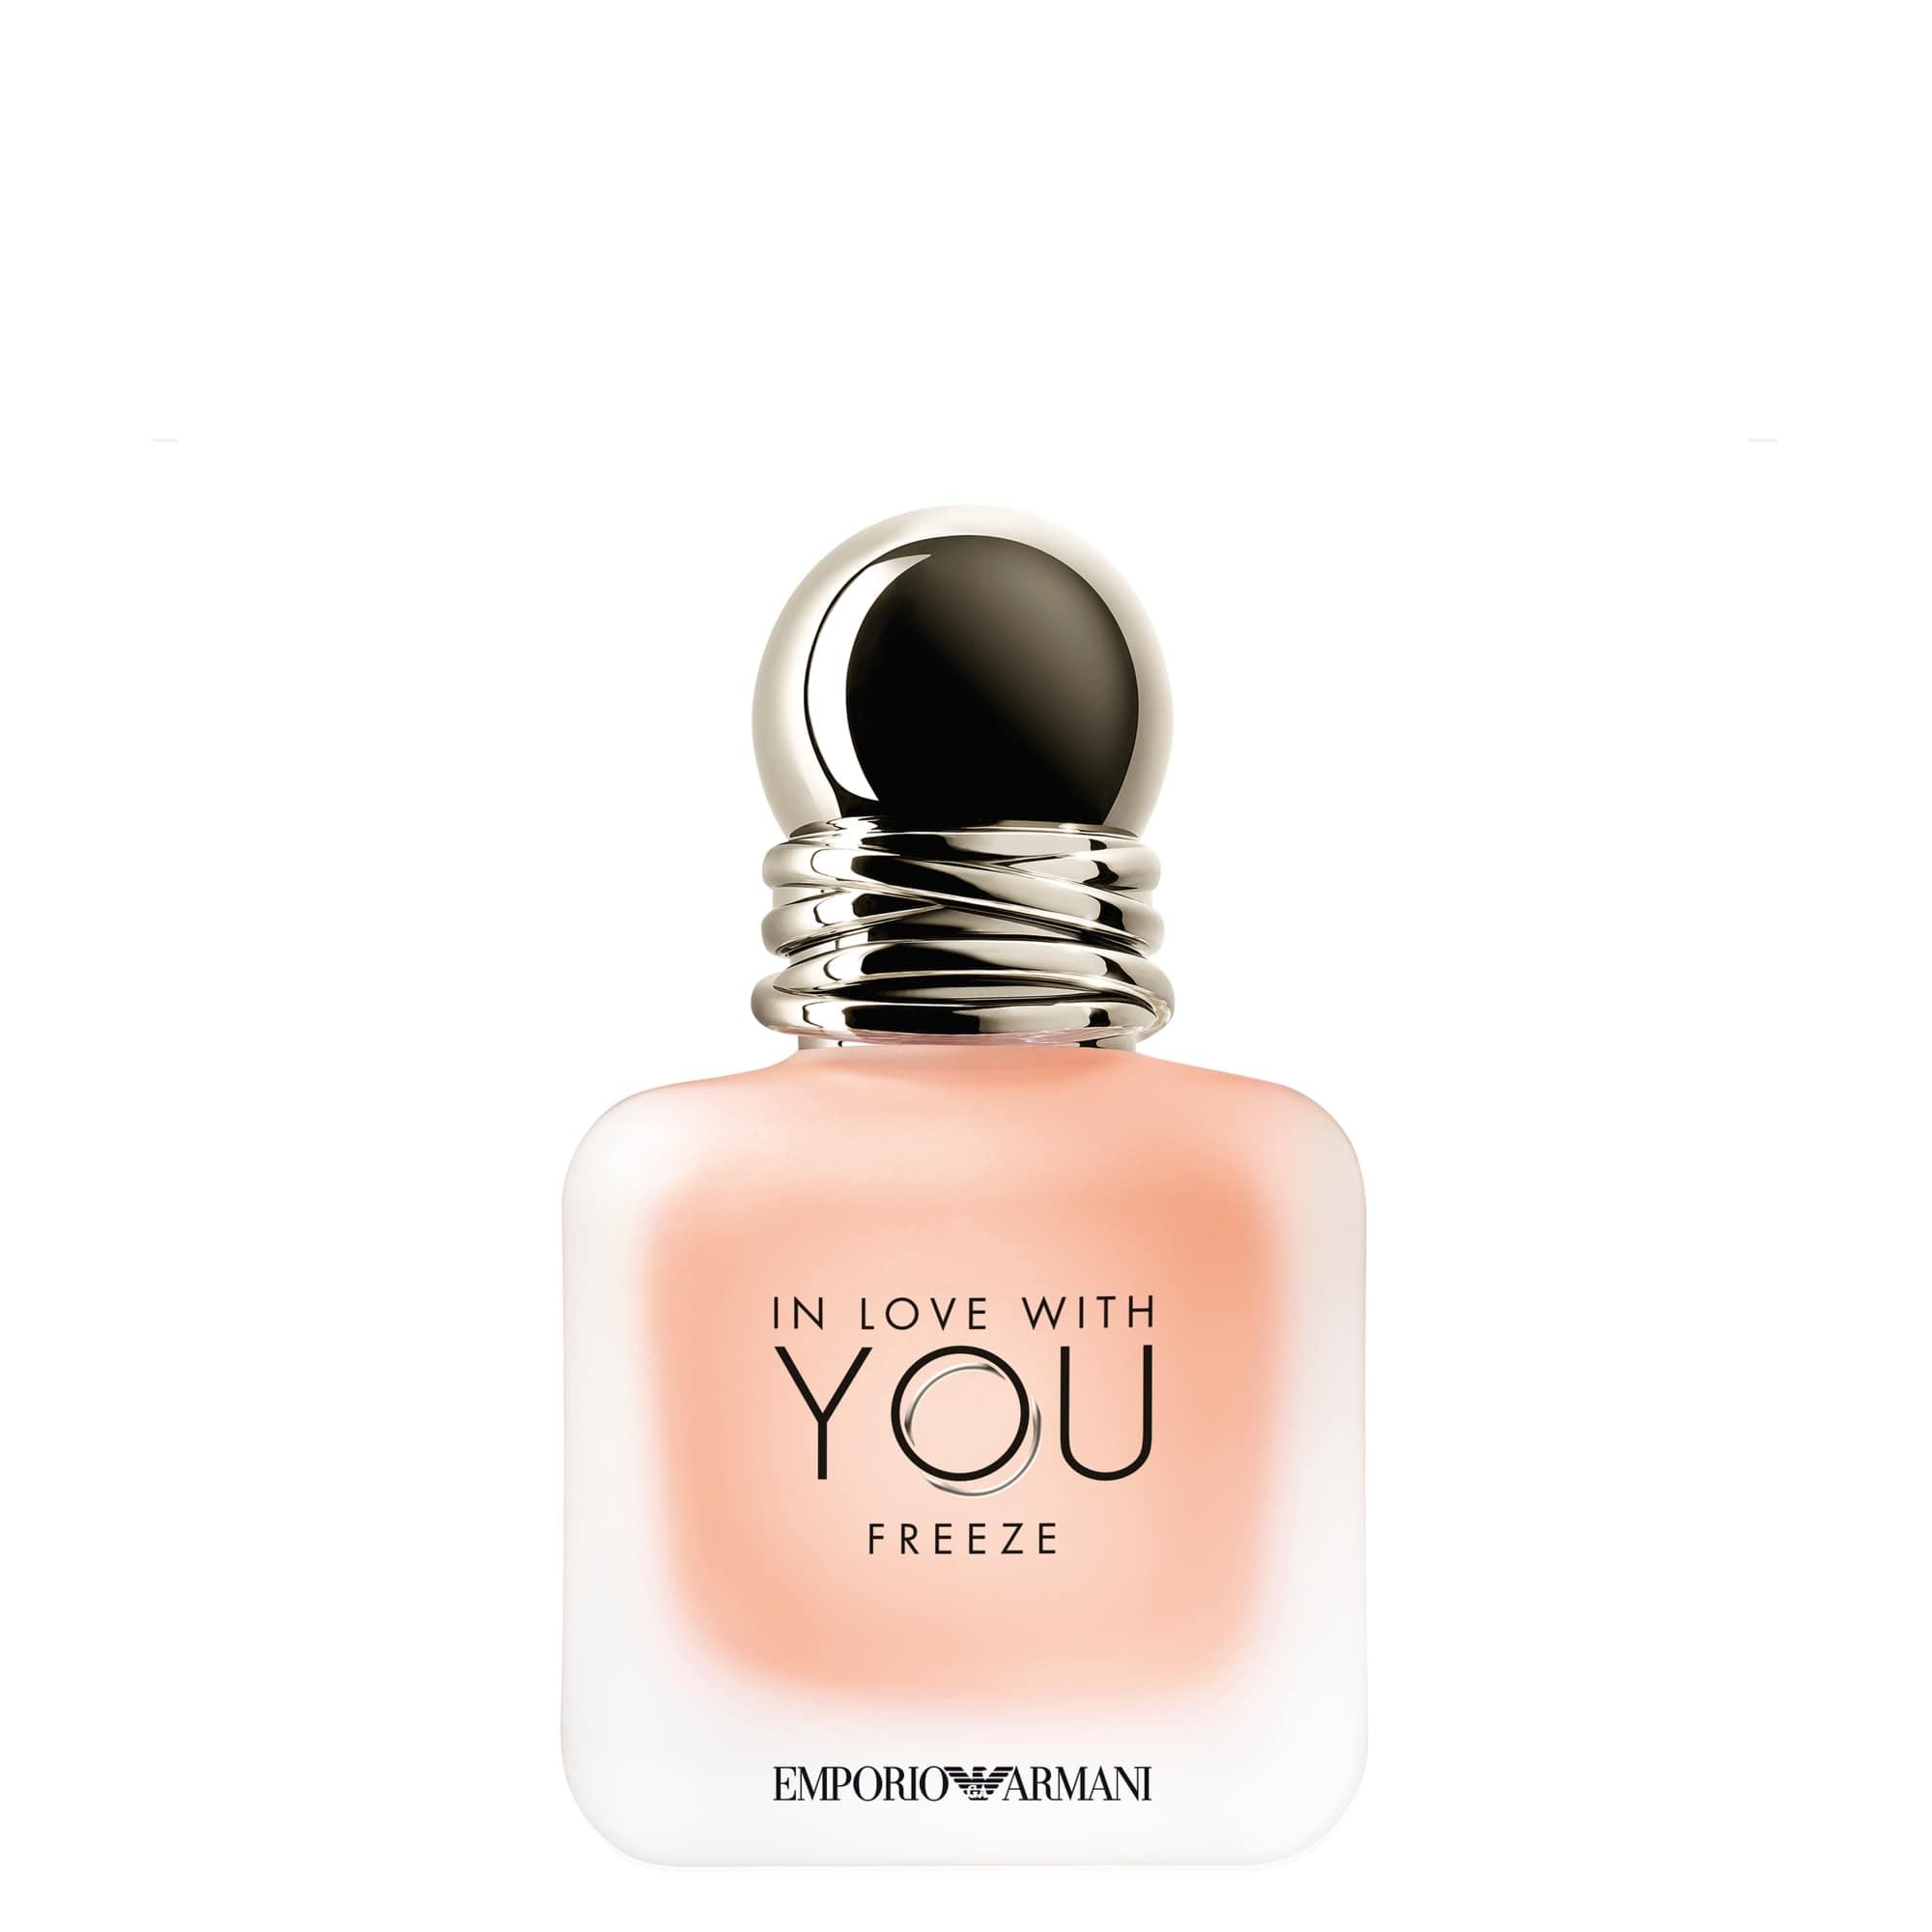 Giorgio Armani In Love With You Freeze EDP, 30 ml